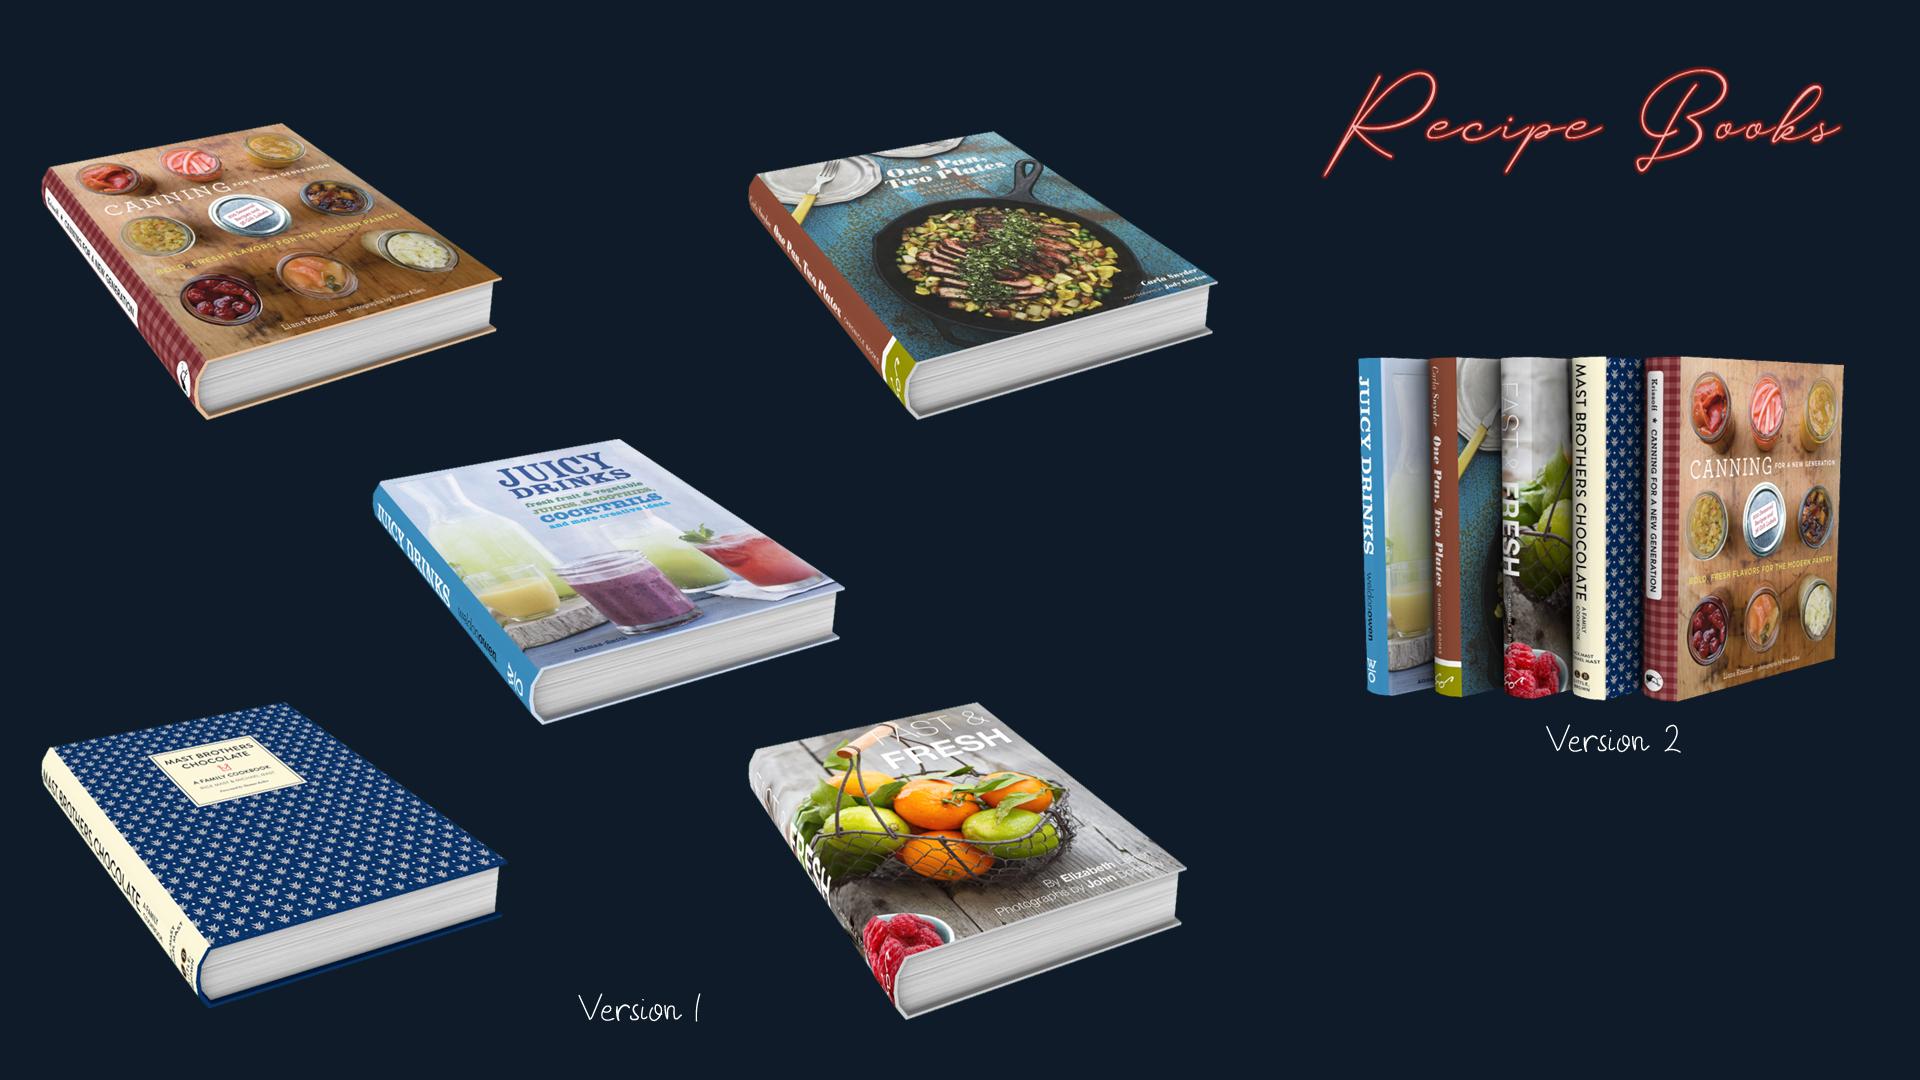 Recipe Books, high quality sims 4 cc, sunkissedlilacs, free sims 4 furniture, sims 4 custom content,